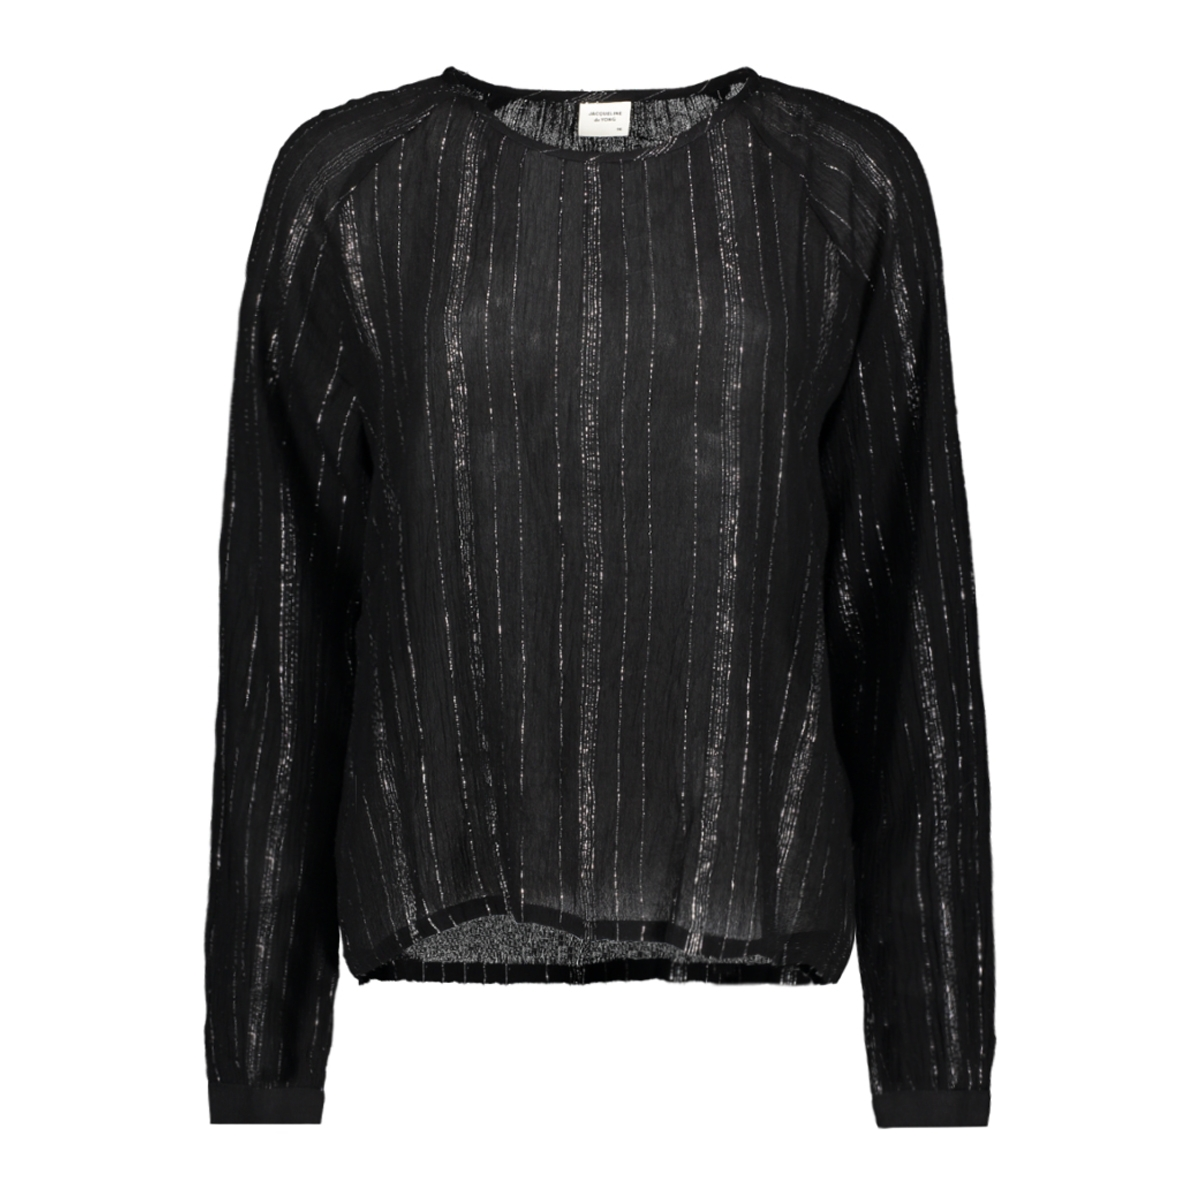 jdyhelena l/s top wvn 15166150 jacqueline de yong t-shirt black/silver lurex